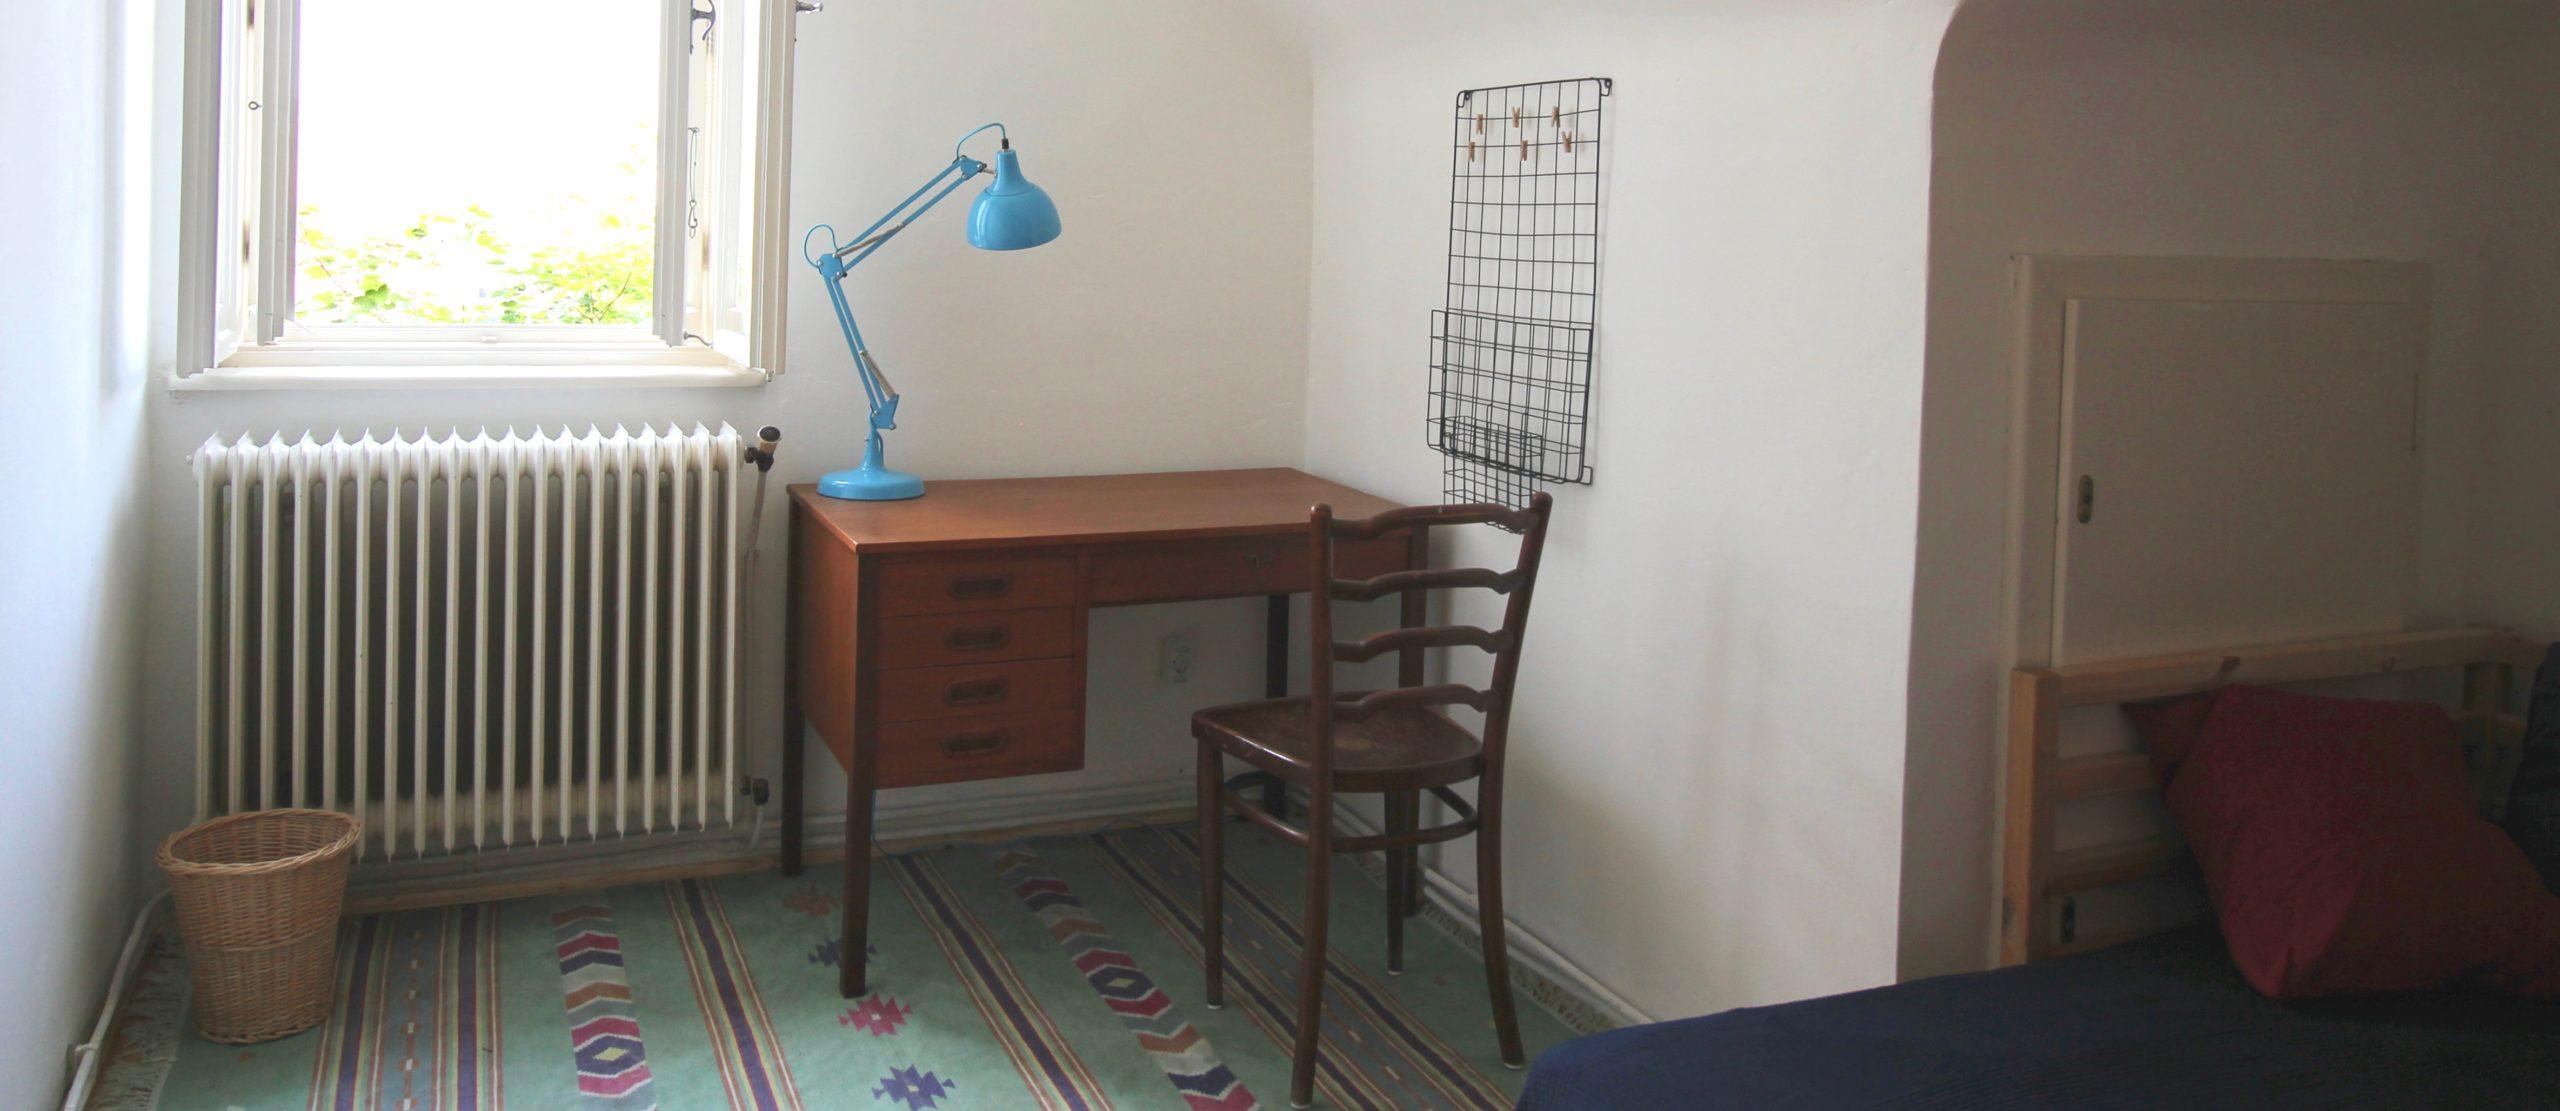 Arbeitszimmer-Arbeitsplatz-Homeoffice